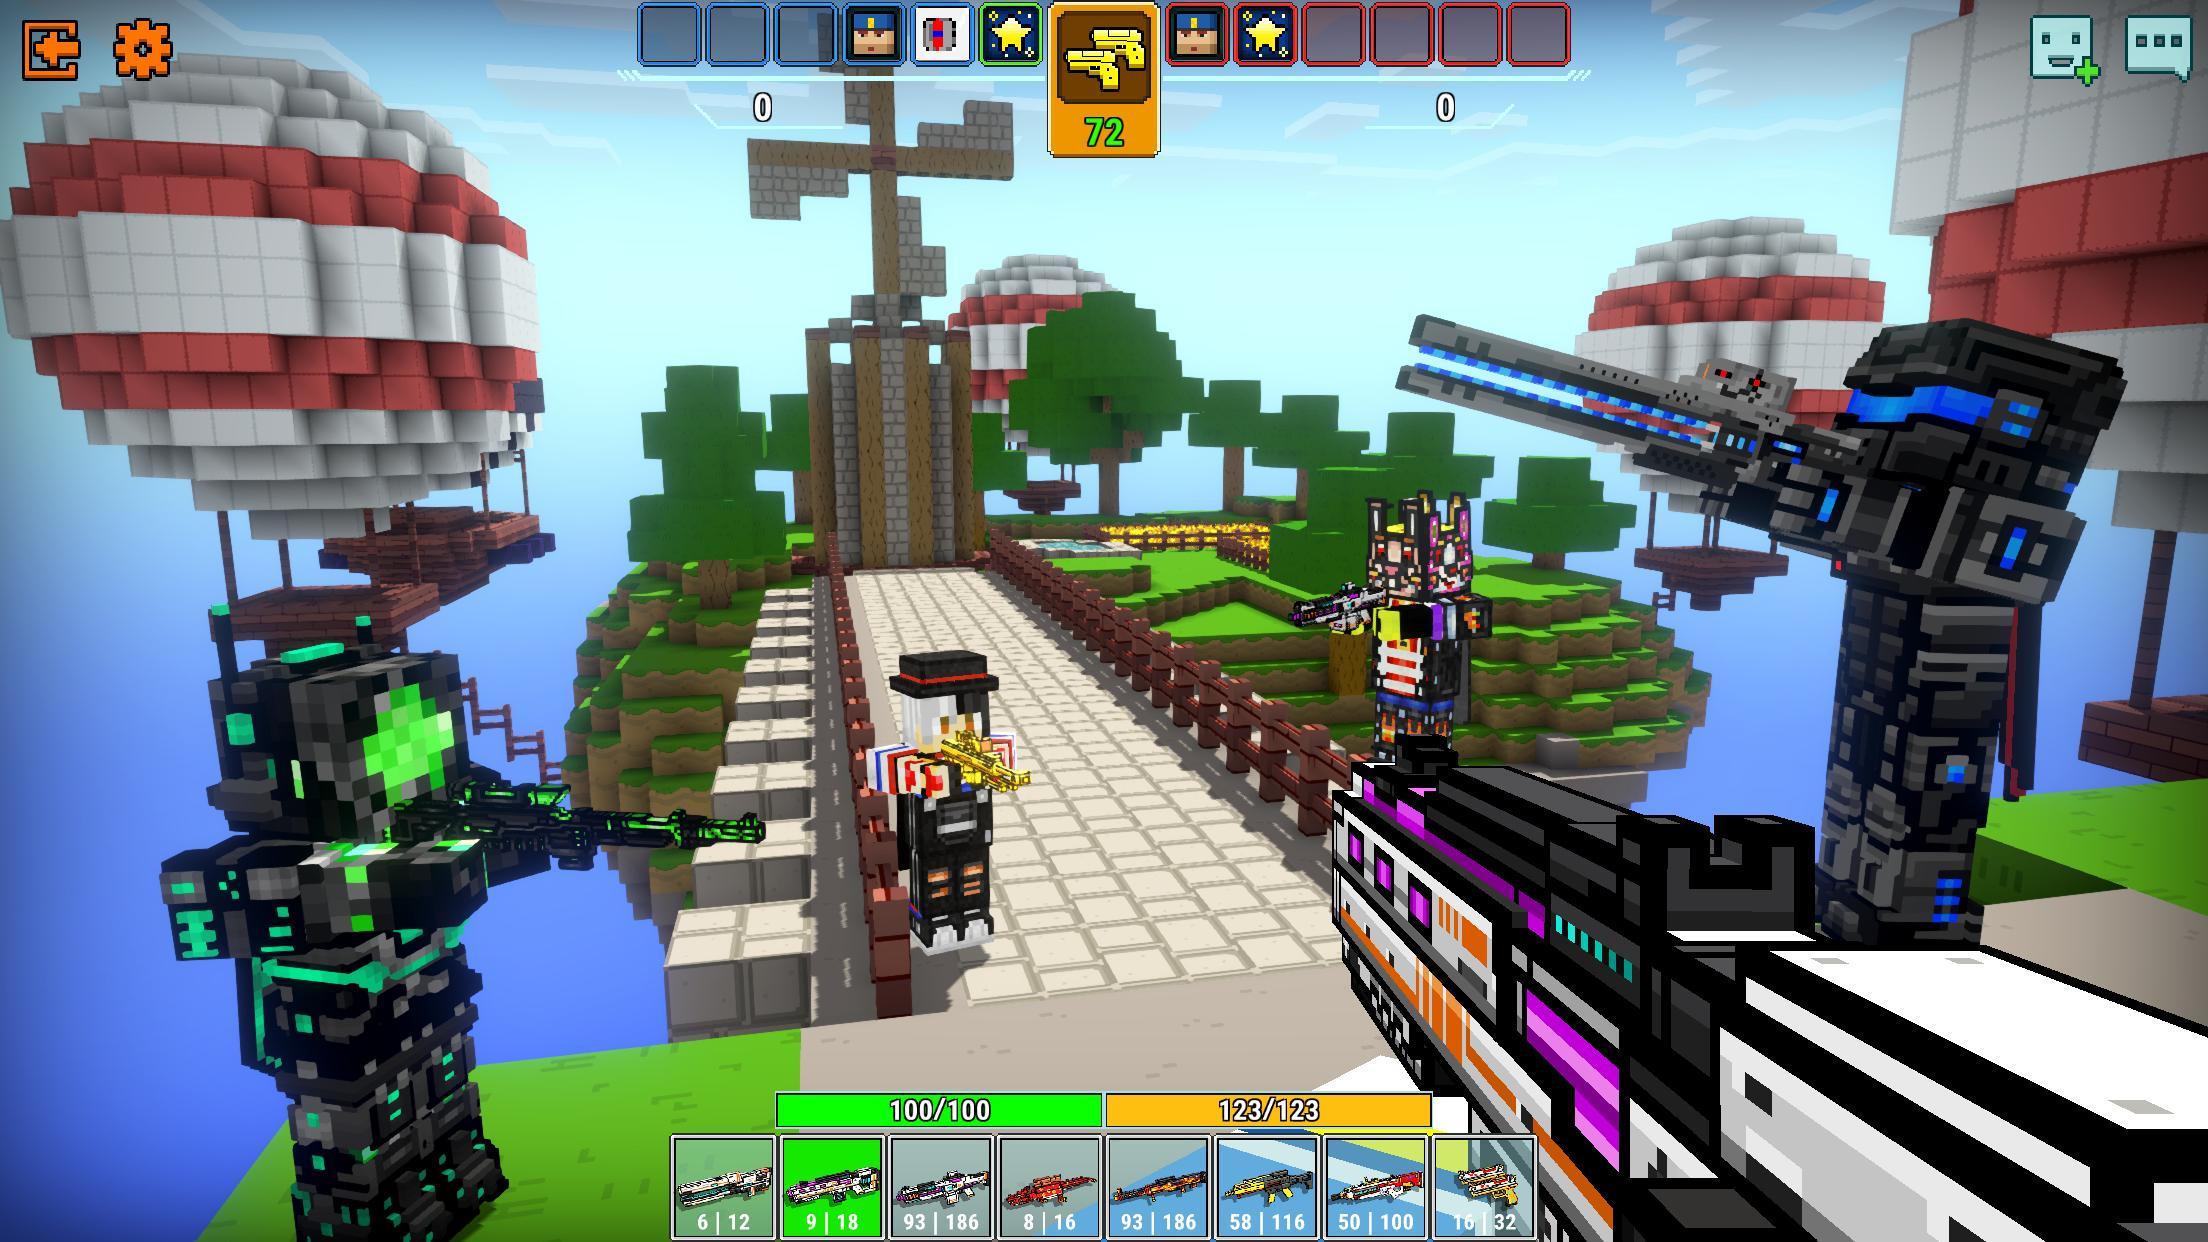 3D Gun Games No Download cops n robbers - 3d pixel craft gun shooting games for